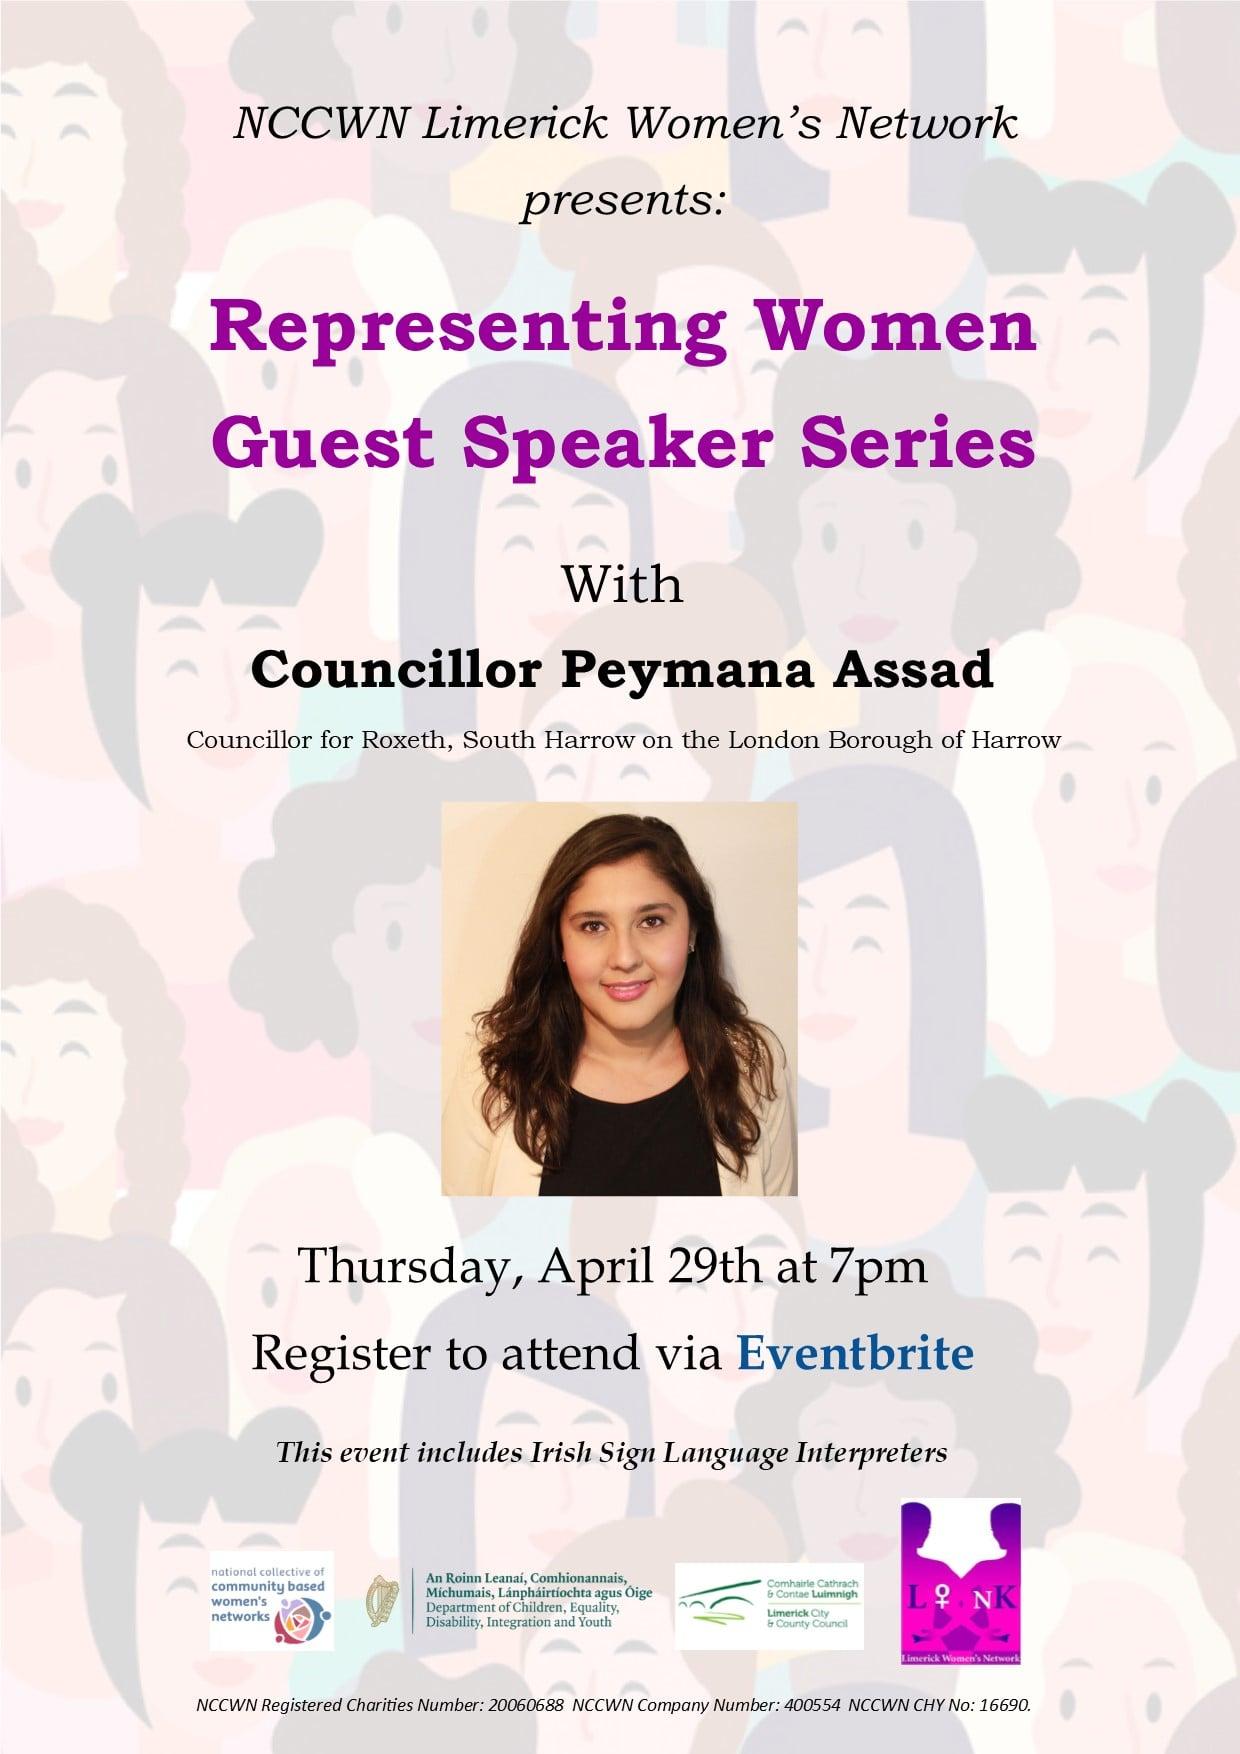 Representing Women - Guest Speaker Series. Our next webinar is with Councillor Peymana Assad